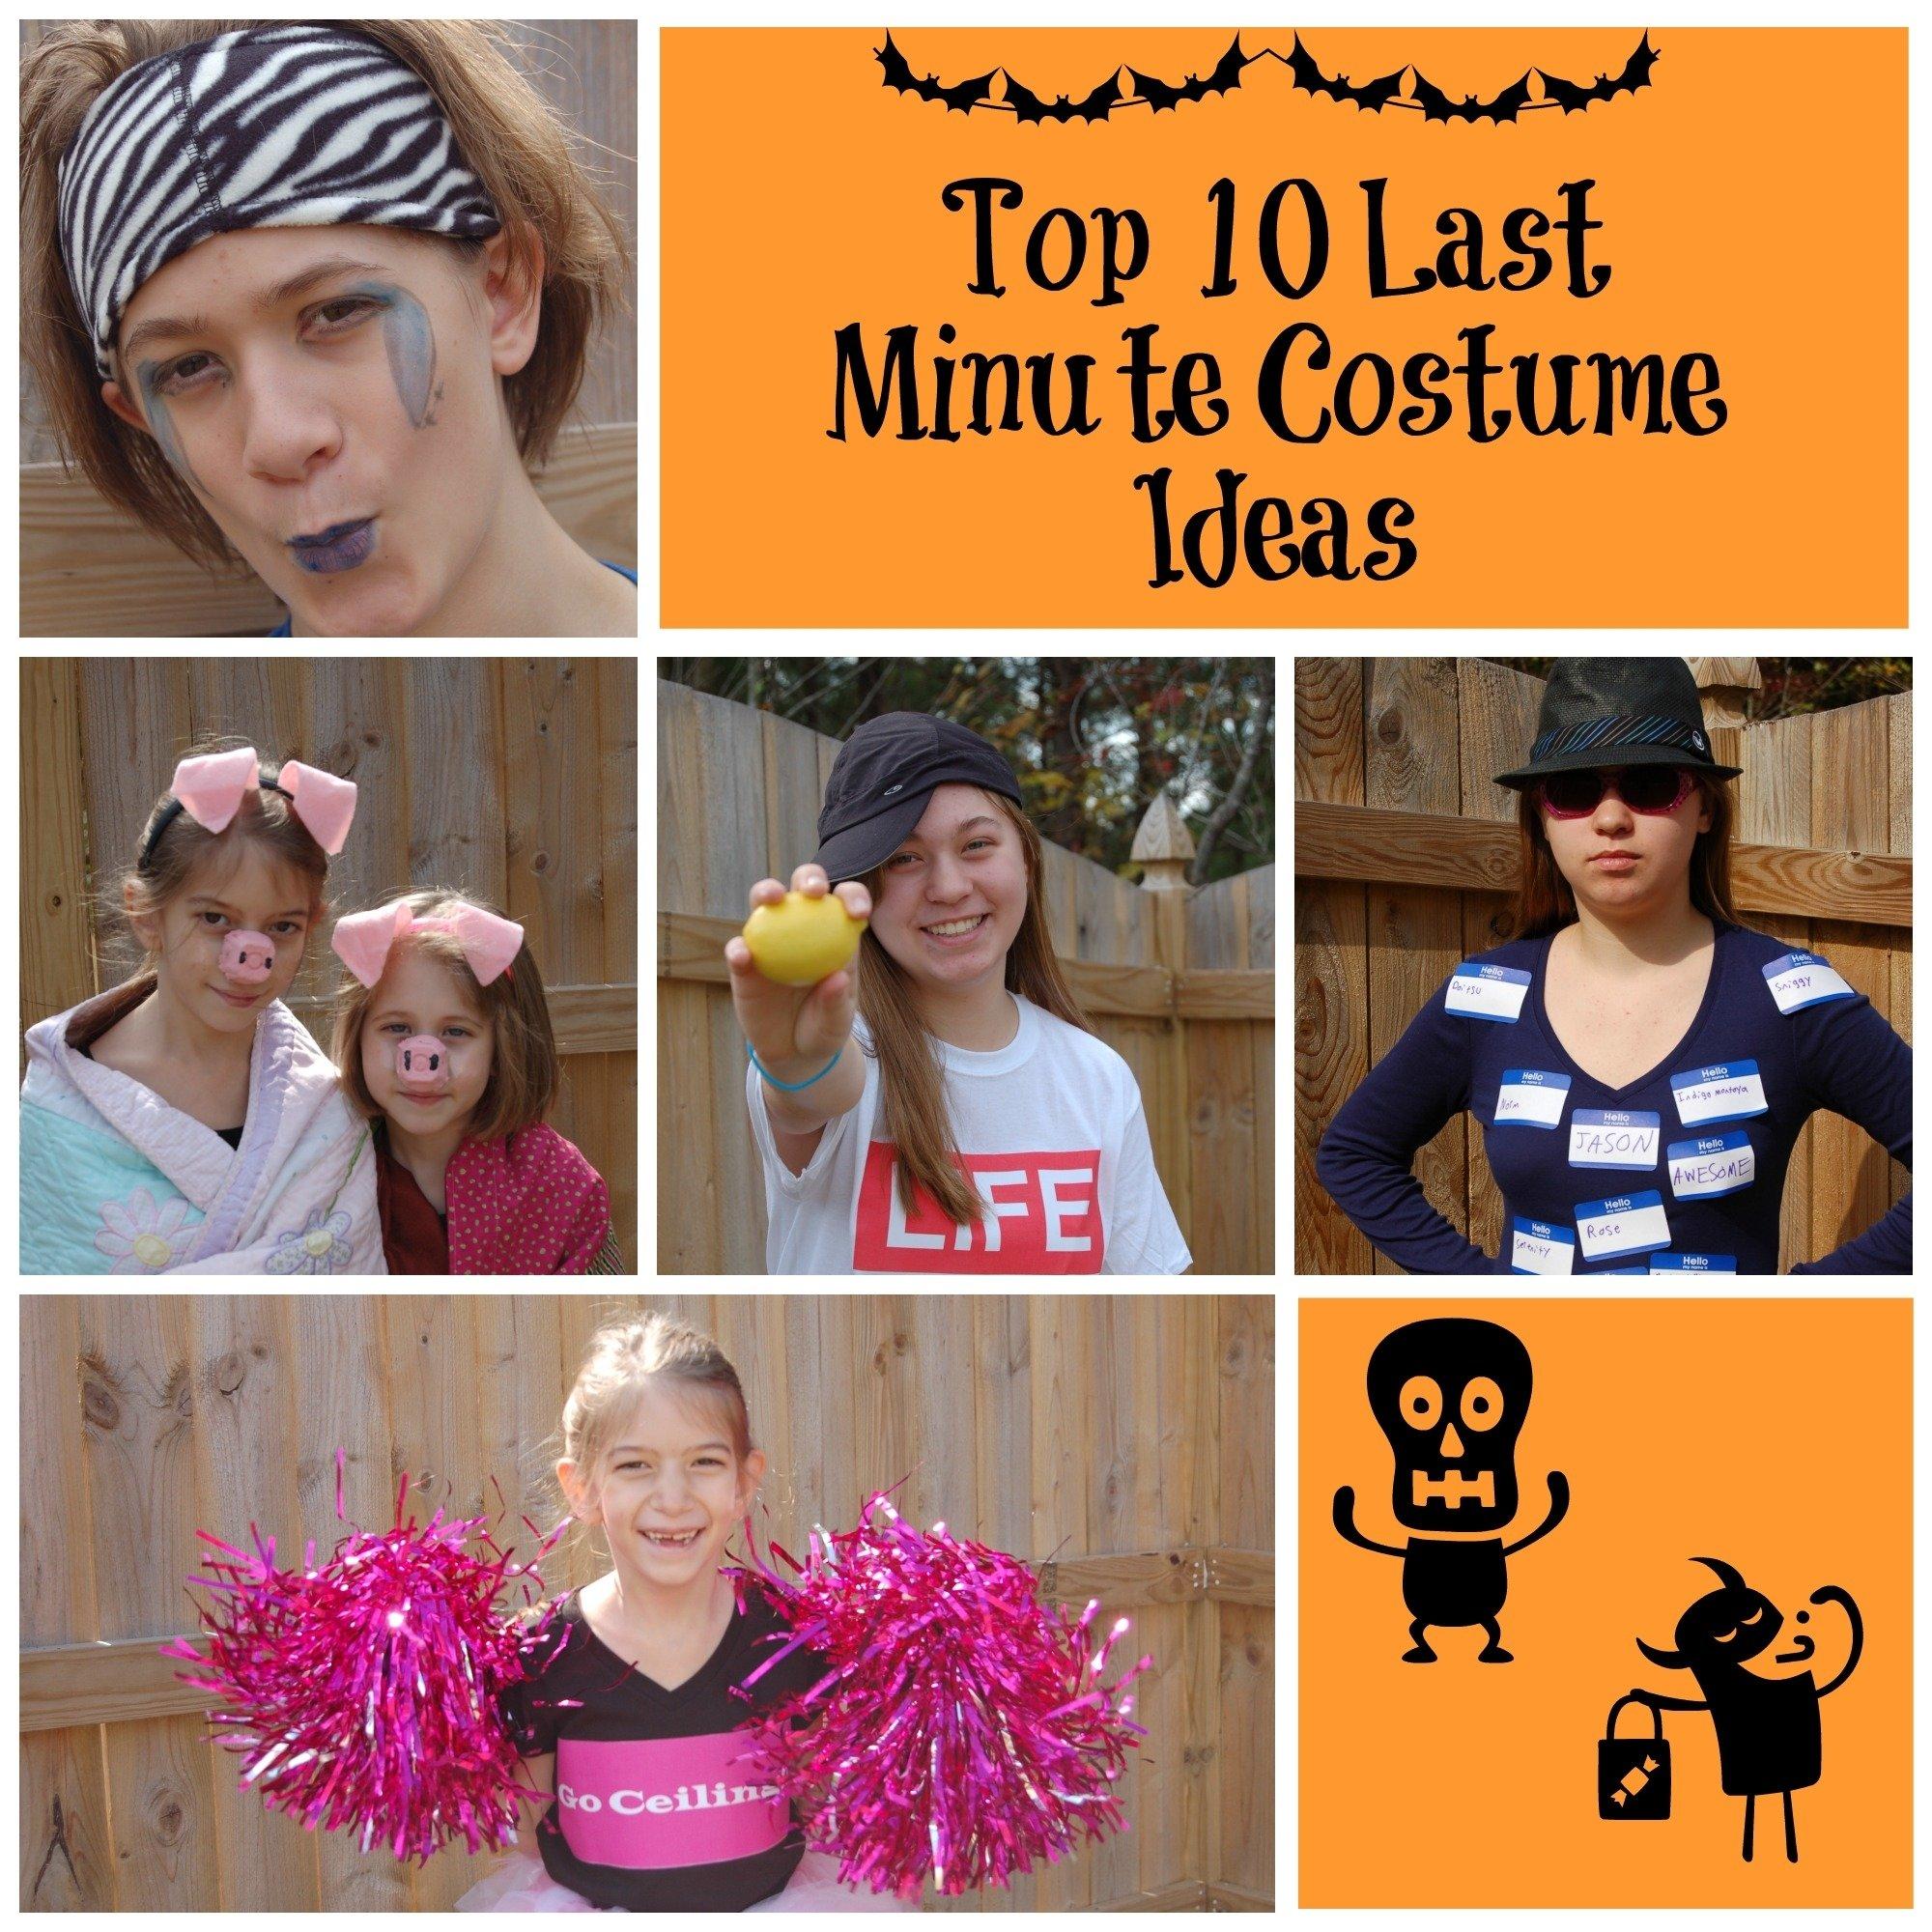 10 Attractive Last Minute Easy Costume Ideas top 10 last minute costume ideas almost supermom 1 2020